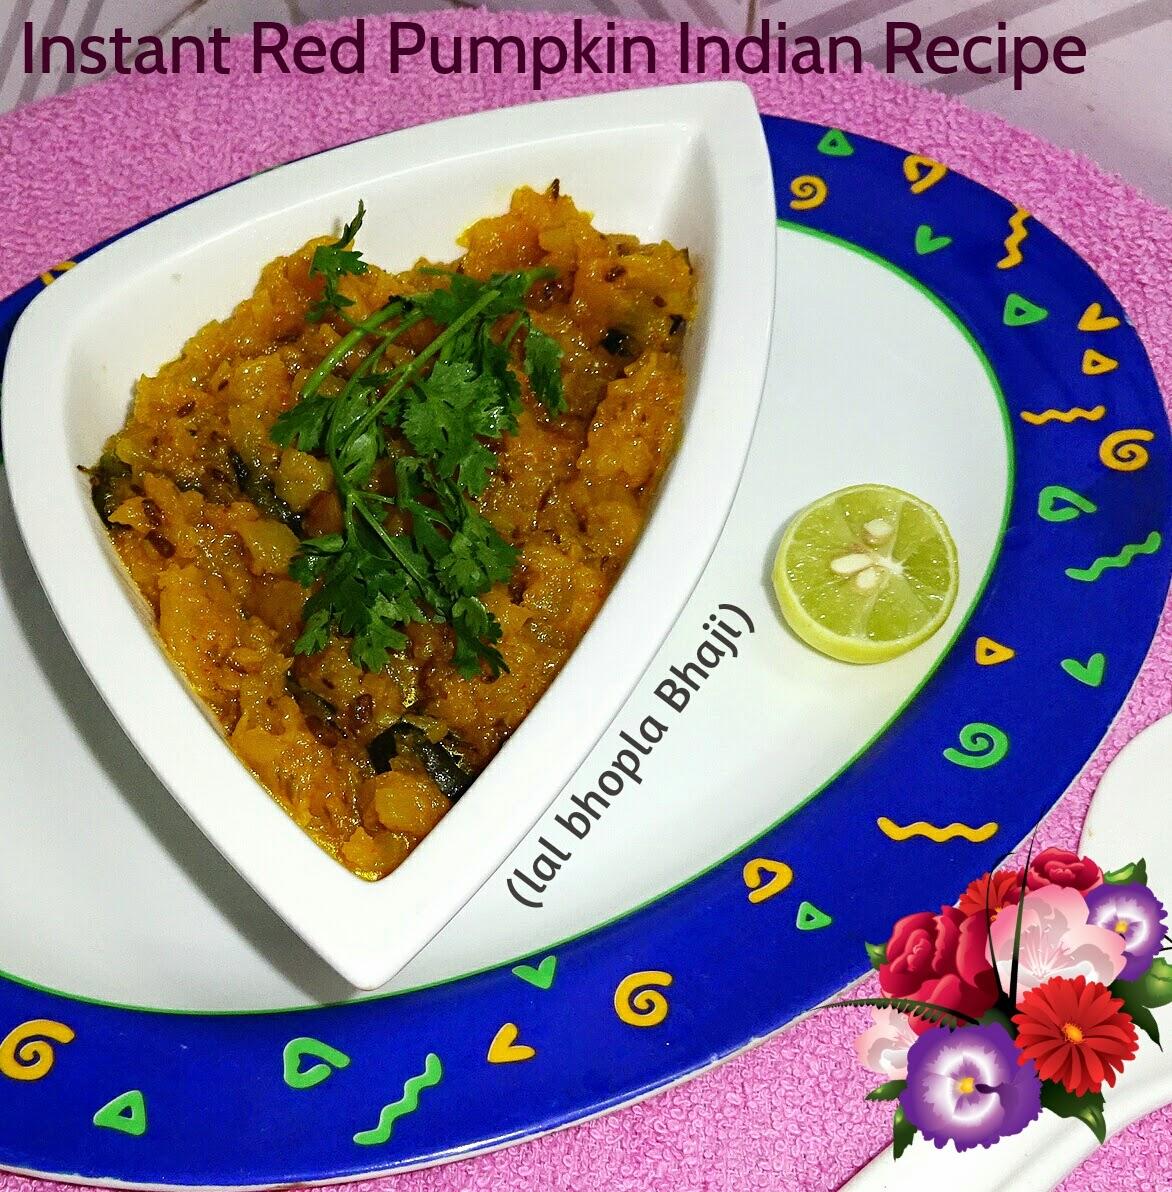 Veg indian good food recipes instant pumpkin recipe lal bhopla veg indian good food recipes instant pumpkin recipe lal bhopla bhaji forumfinder Images